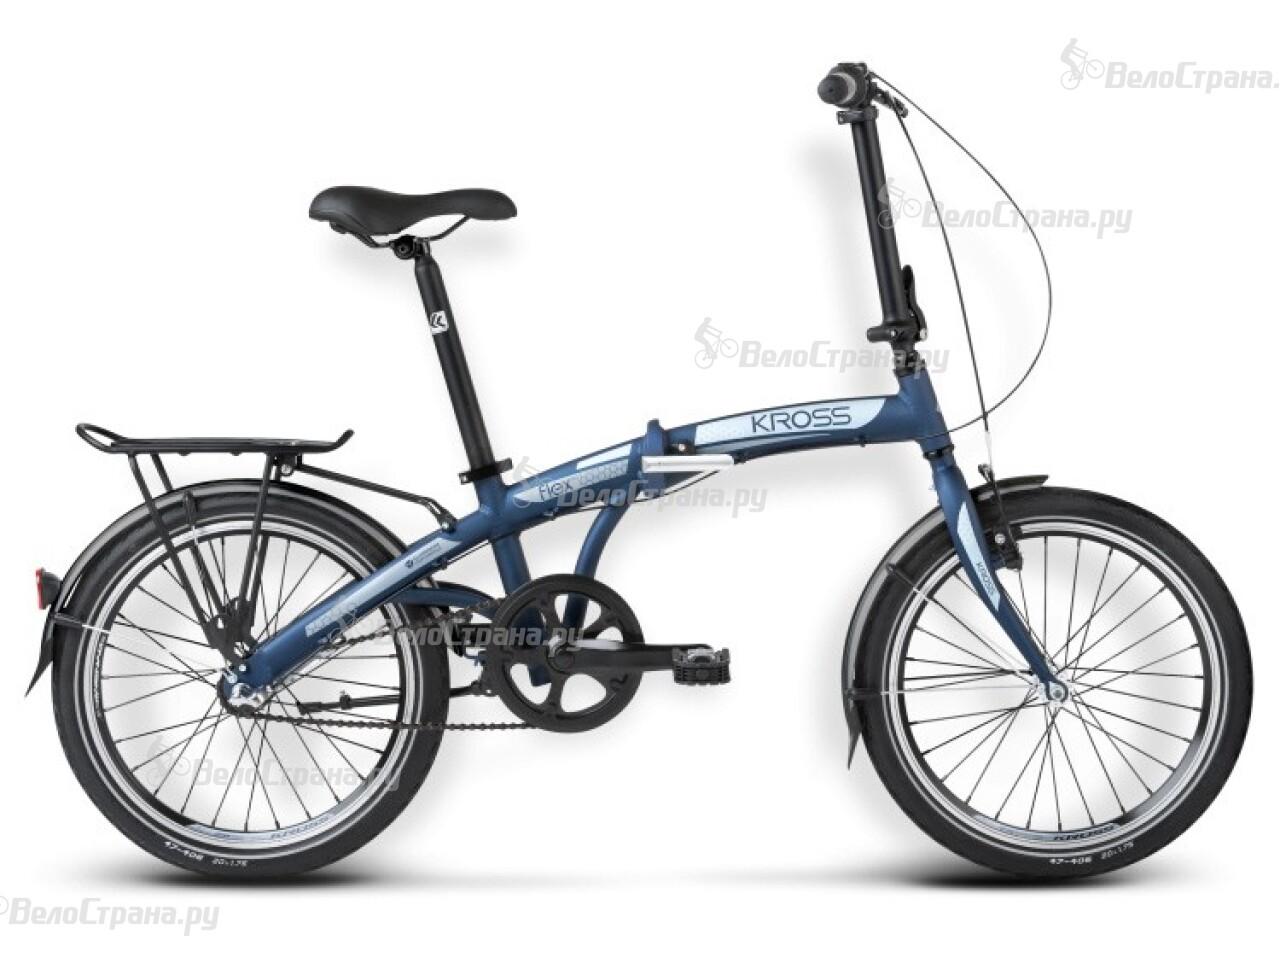 Велосипед Kross FLEX 3.0 (2016) велосипед kross flex 2 0 2015